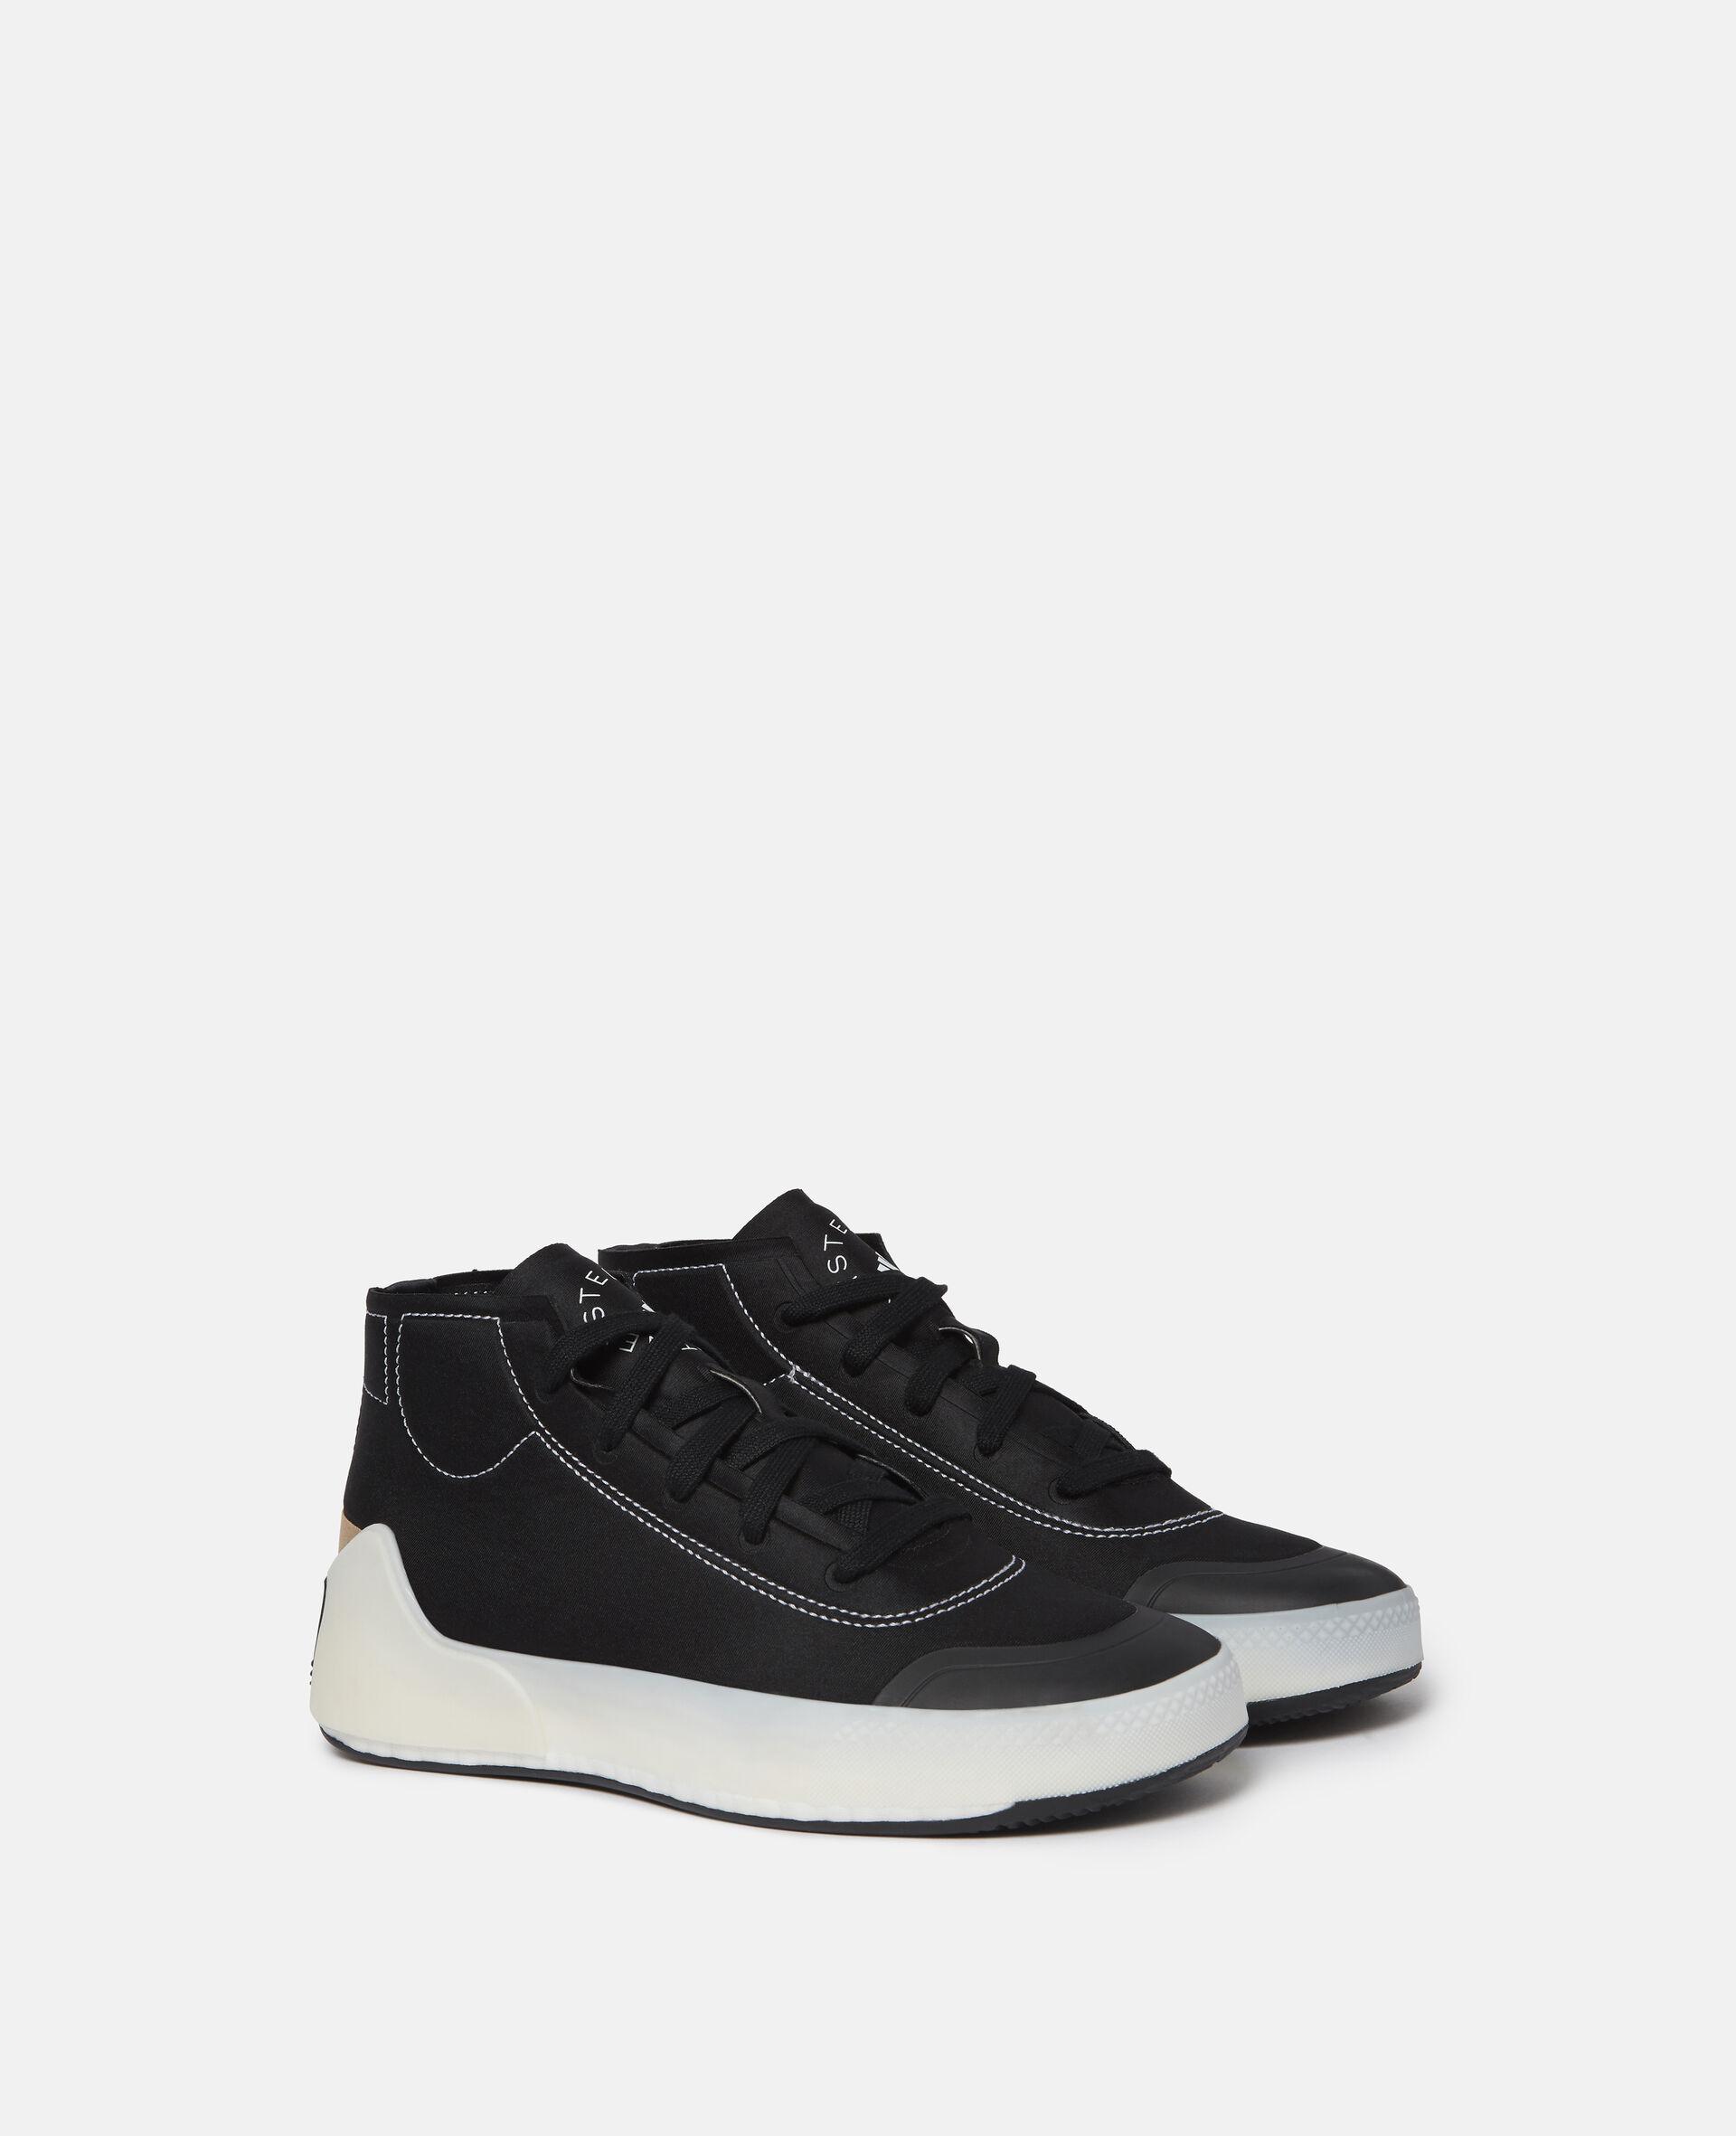 Black Boost Treino Sneakers-Black-large image number 1